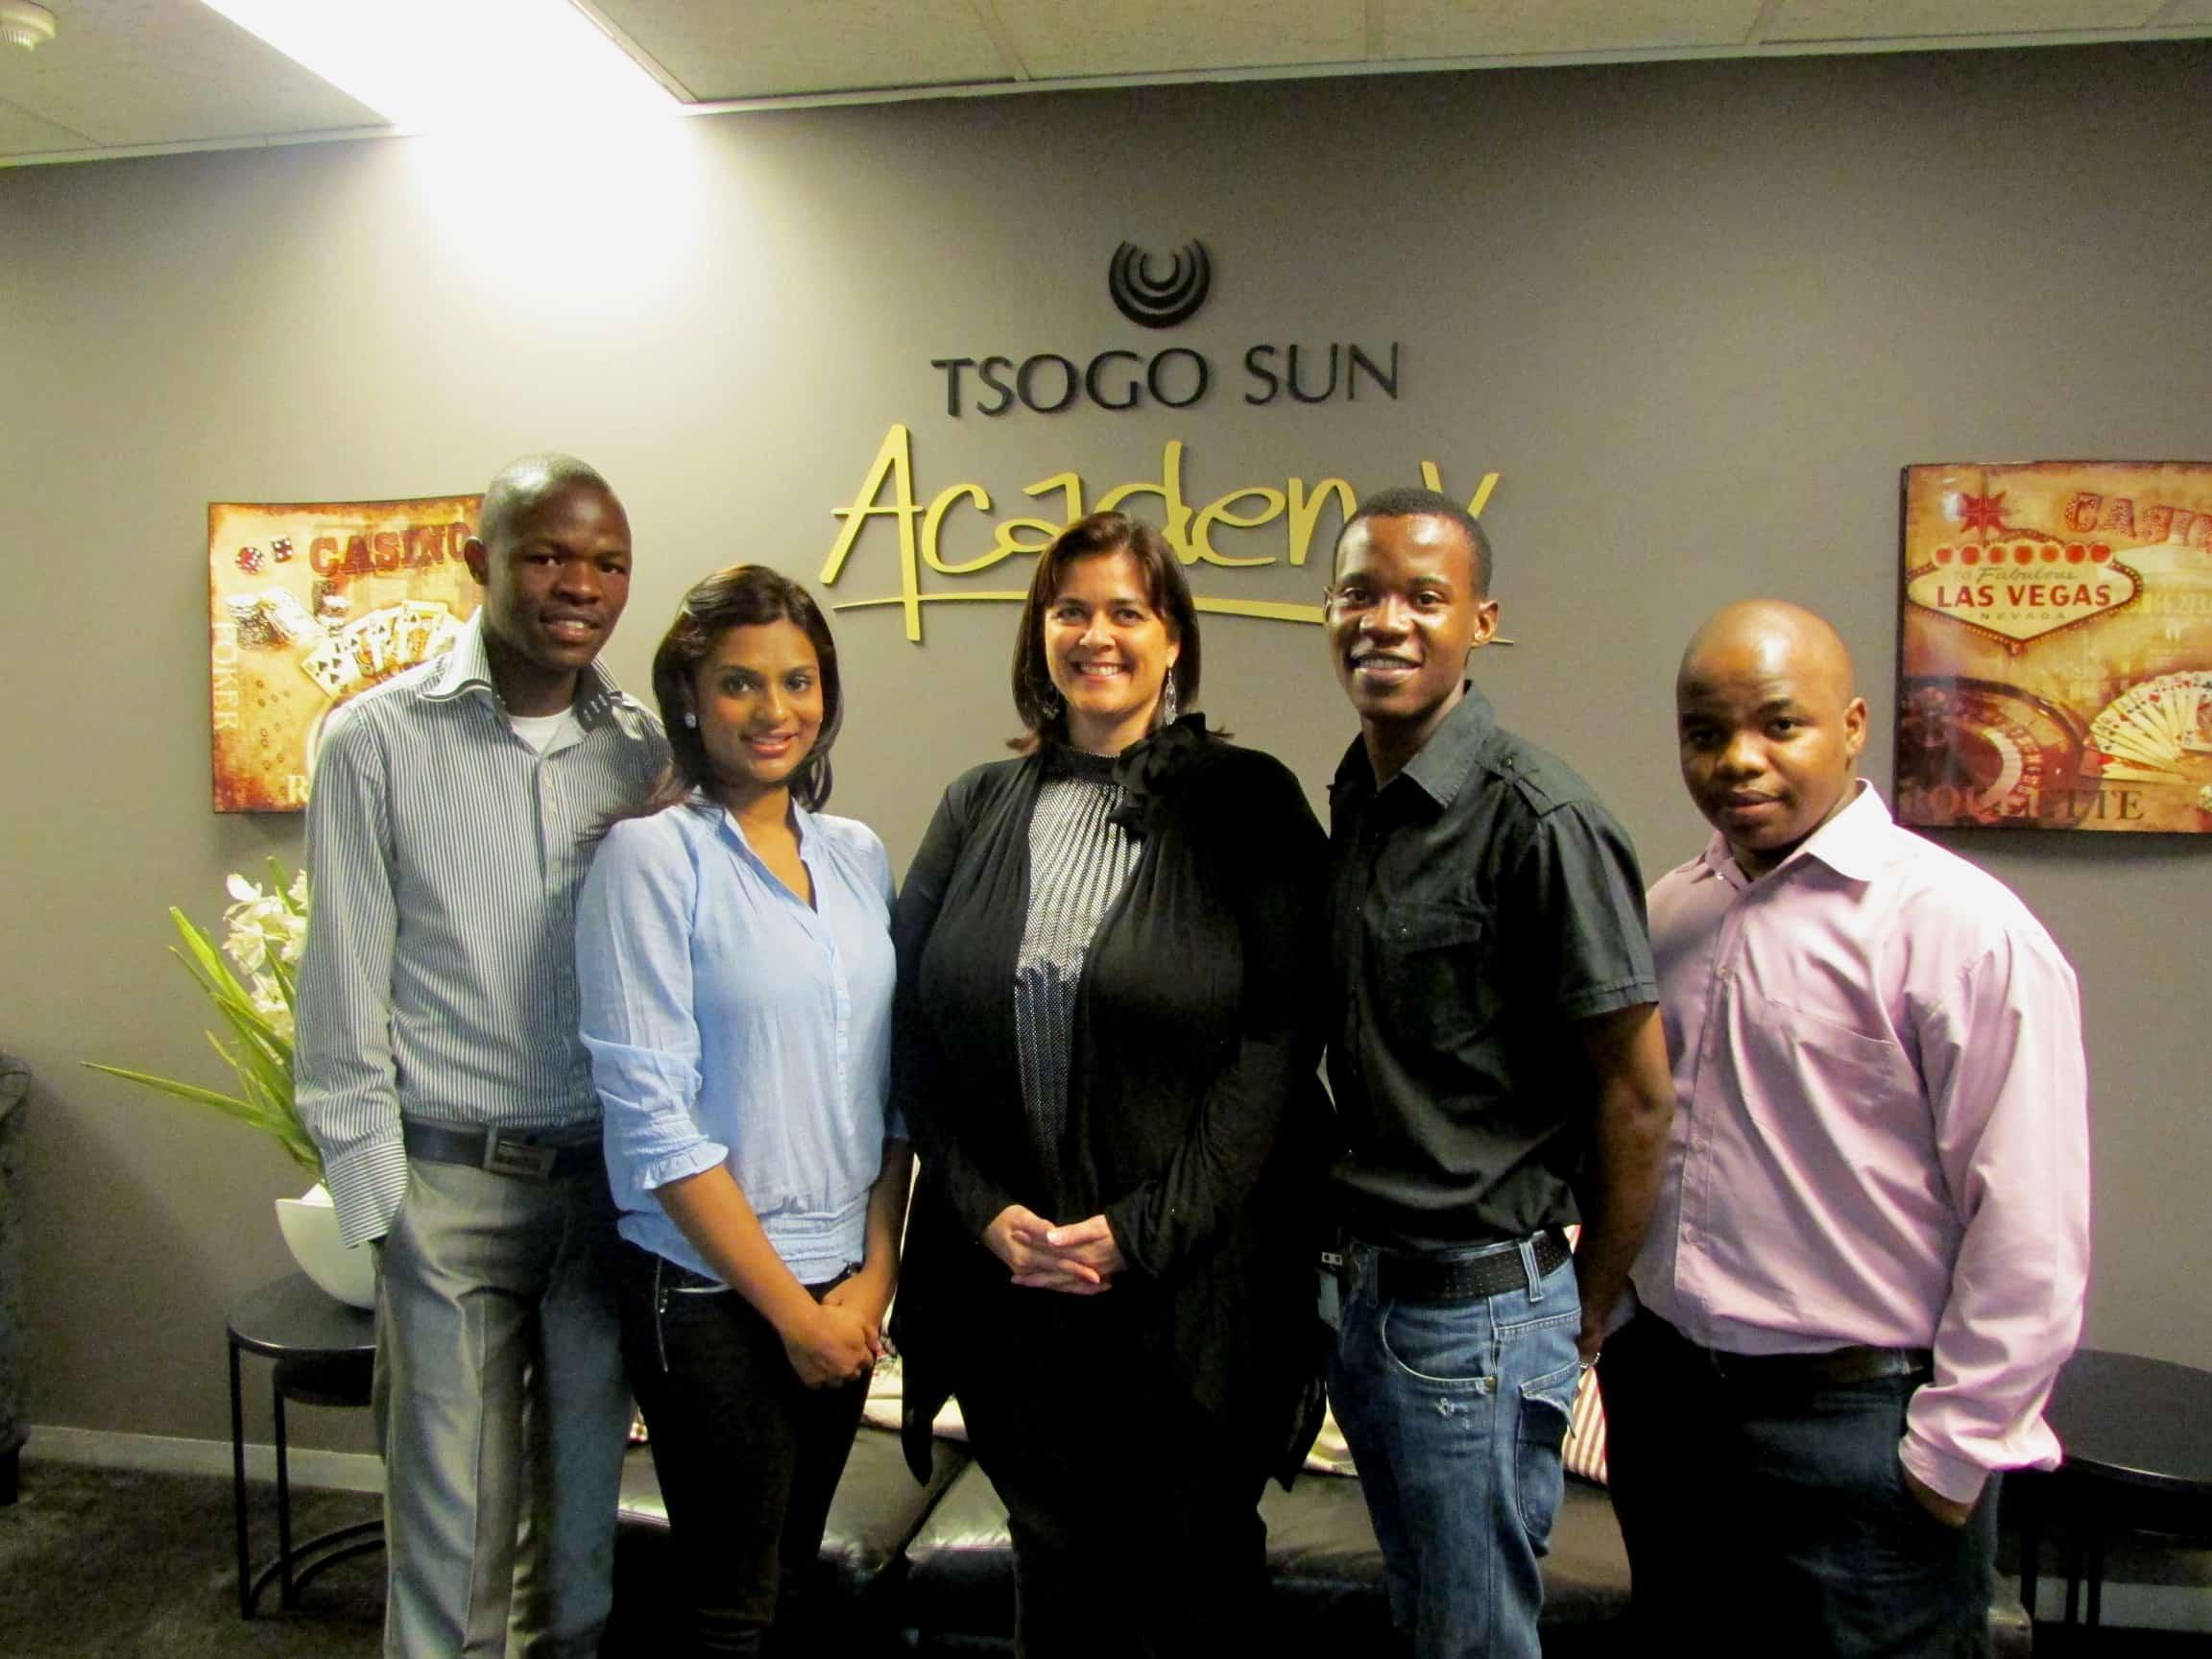 TSG Academy at suncoast casino